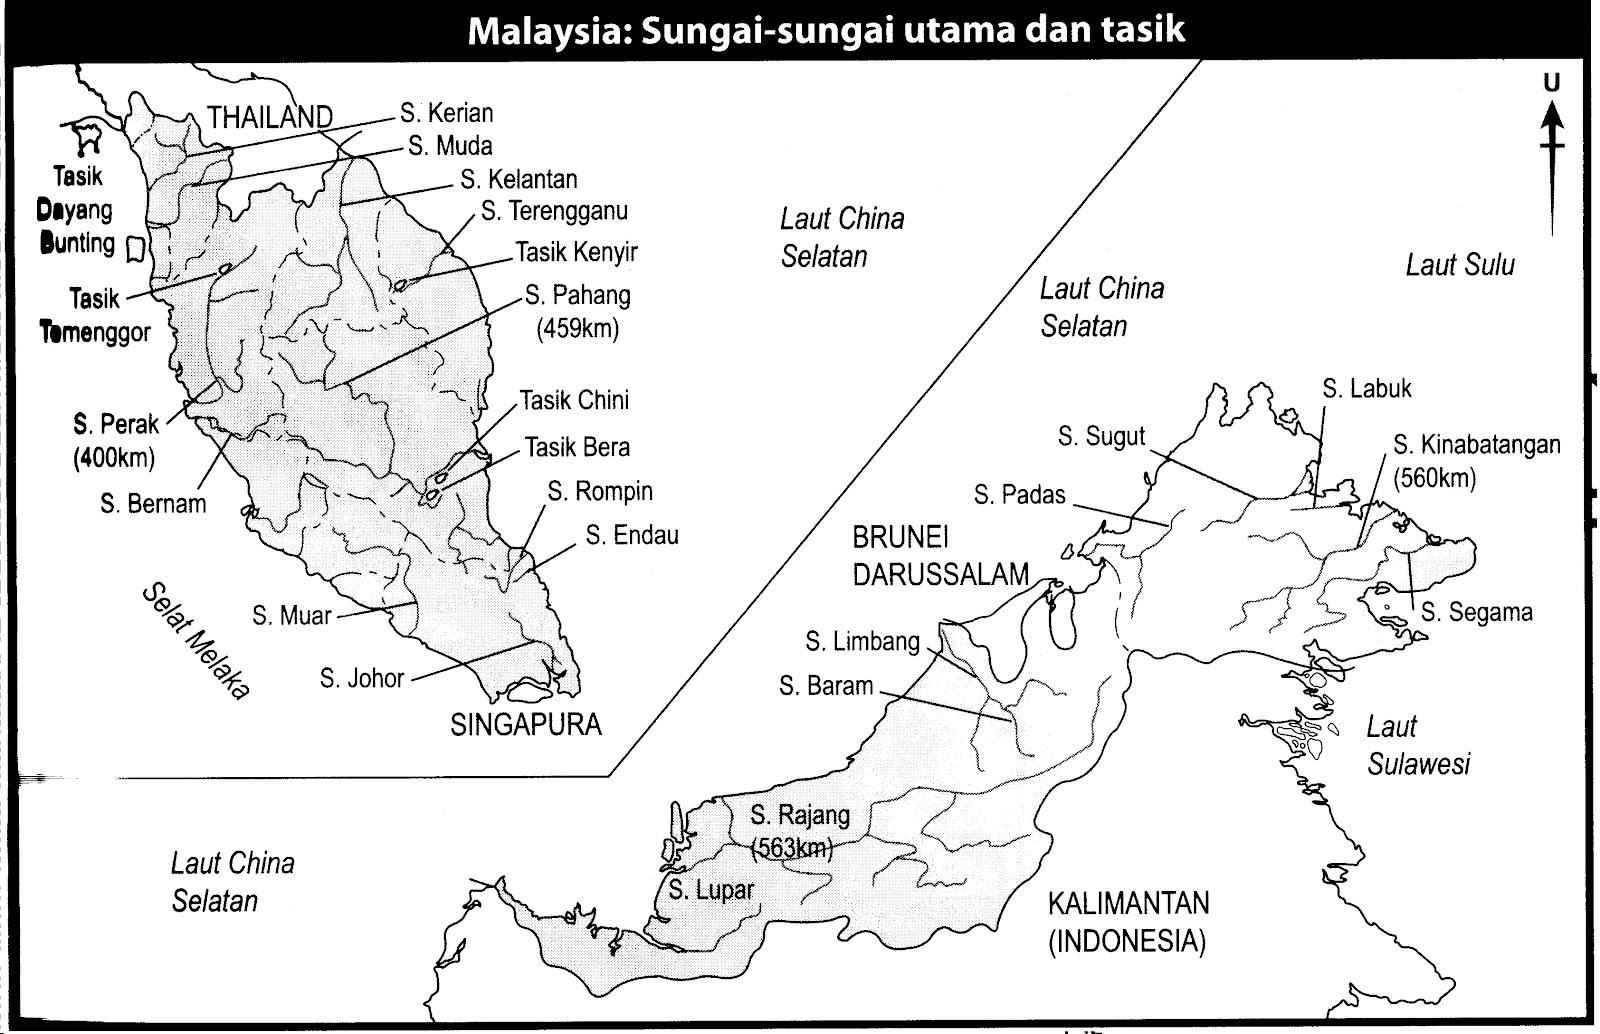 Geografi dan anda